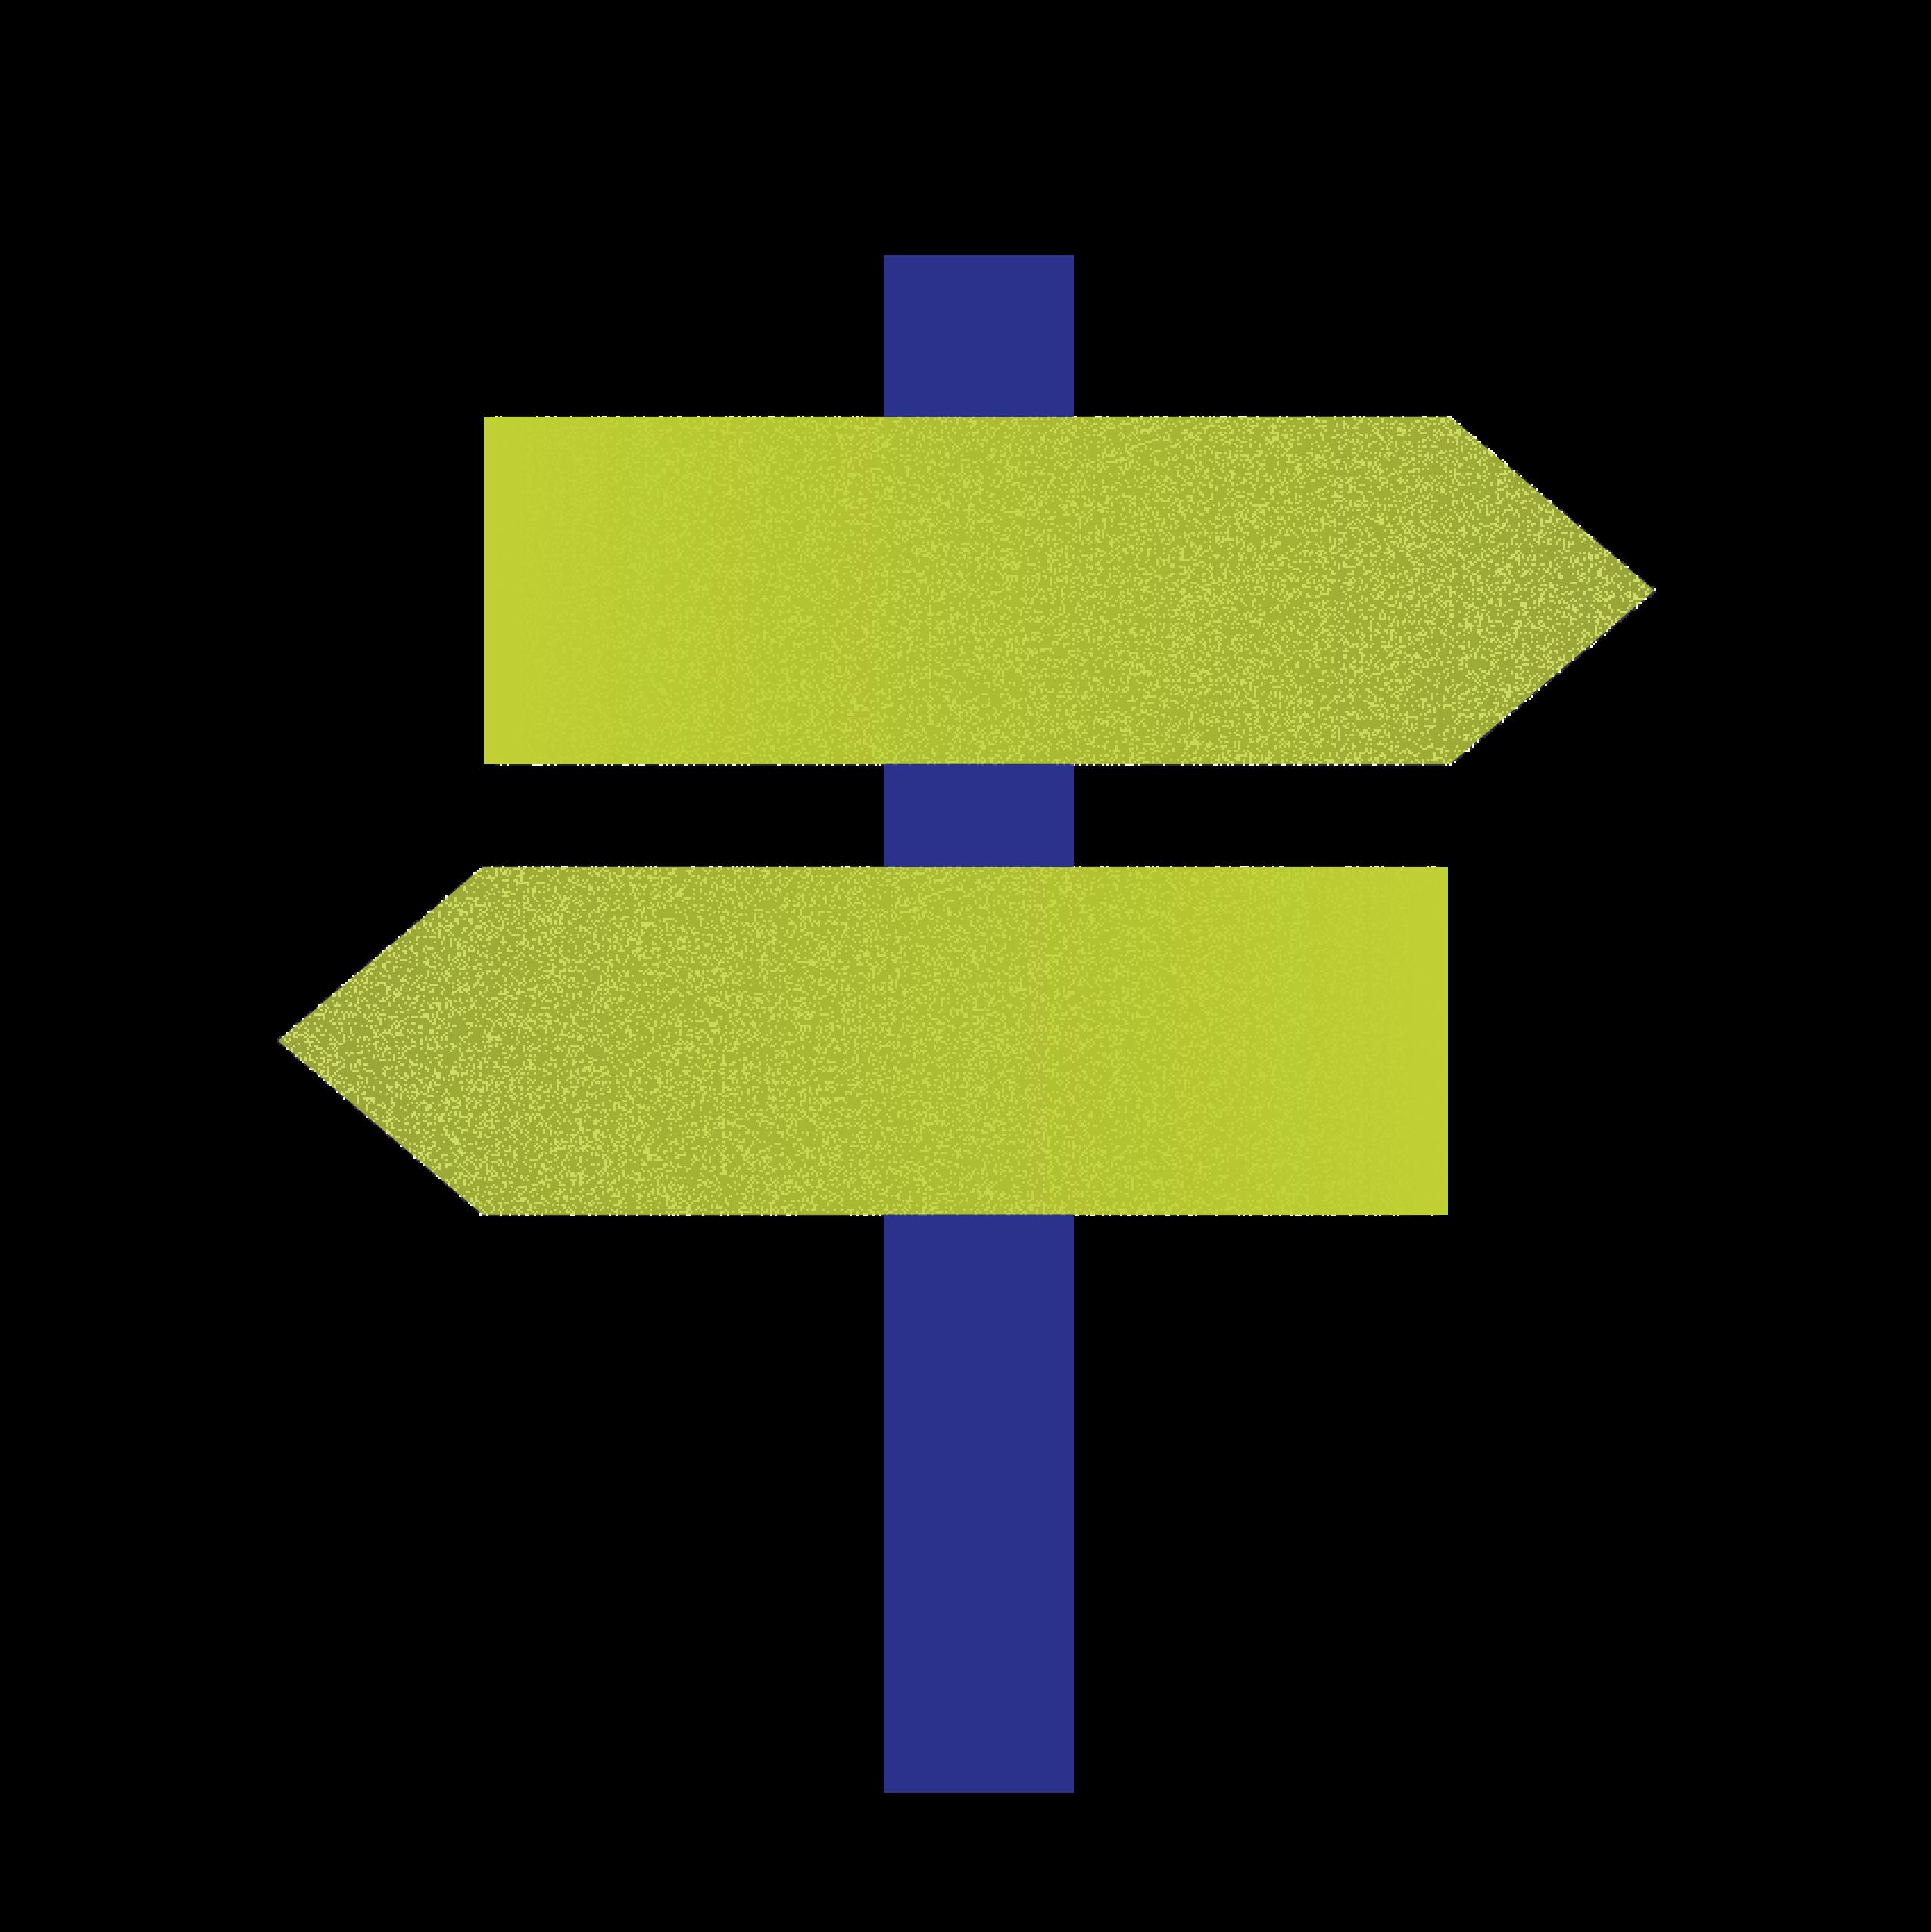 RGB_Signpost